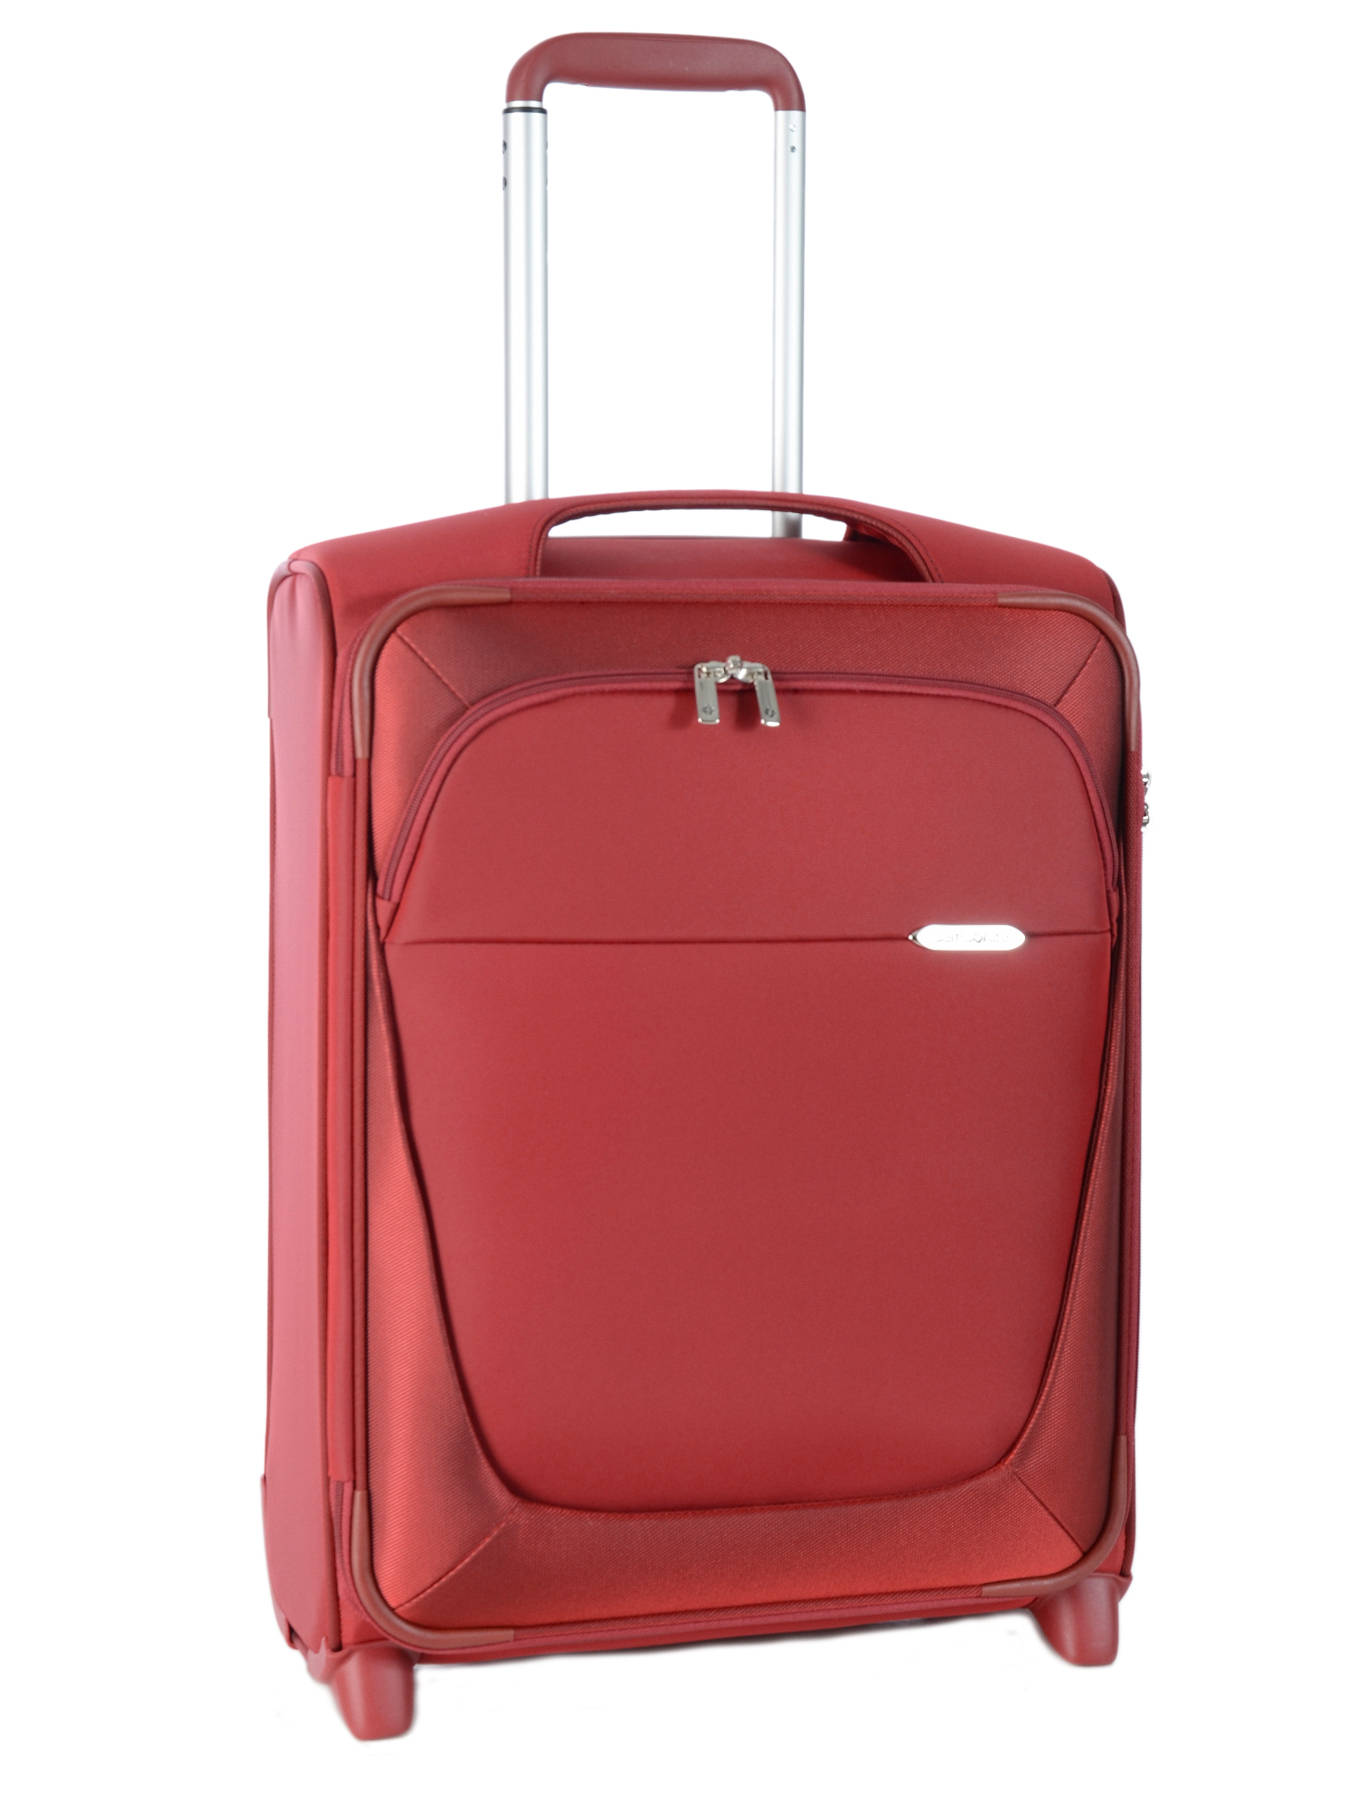 Samsonite carry on suitcase b lite 3 best prices for Samsonite cabin luggage